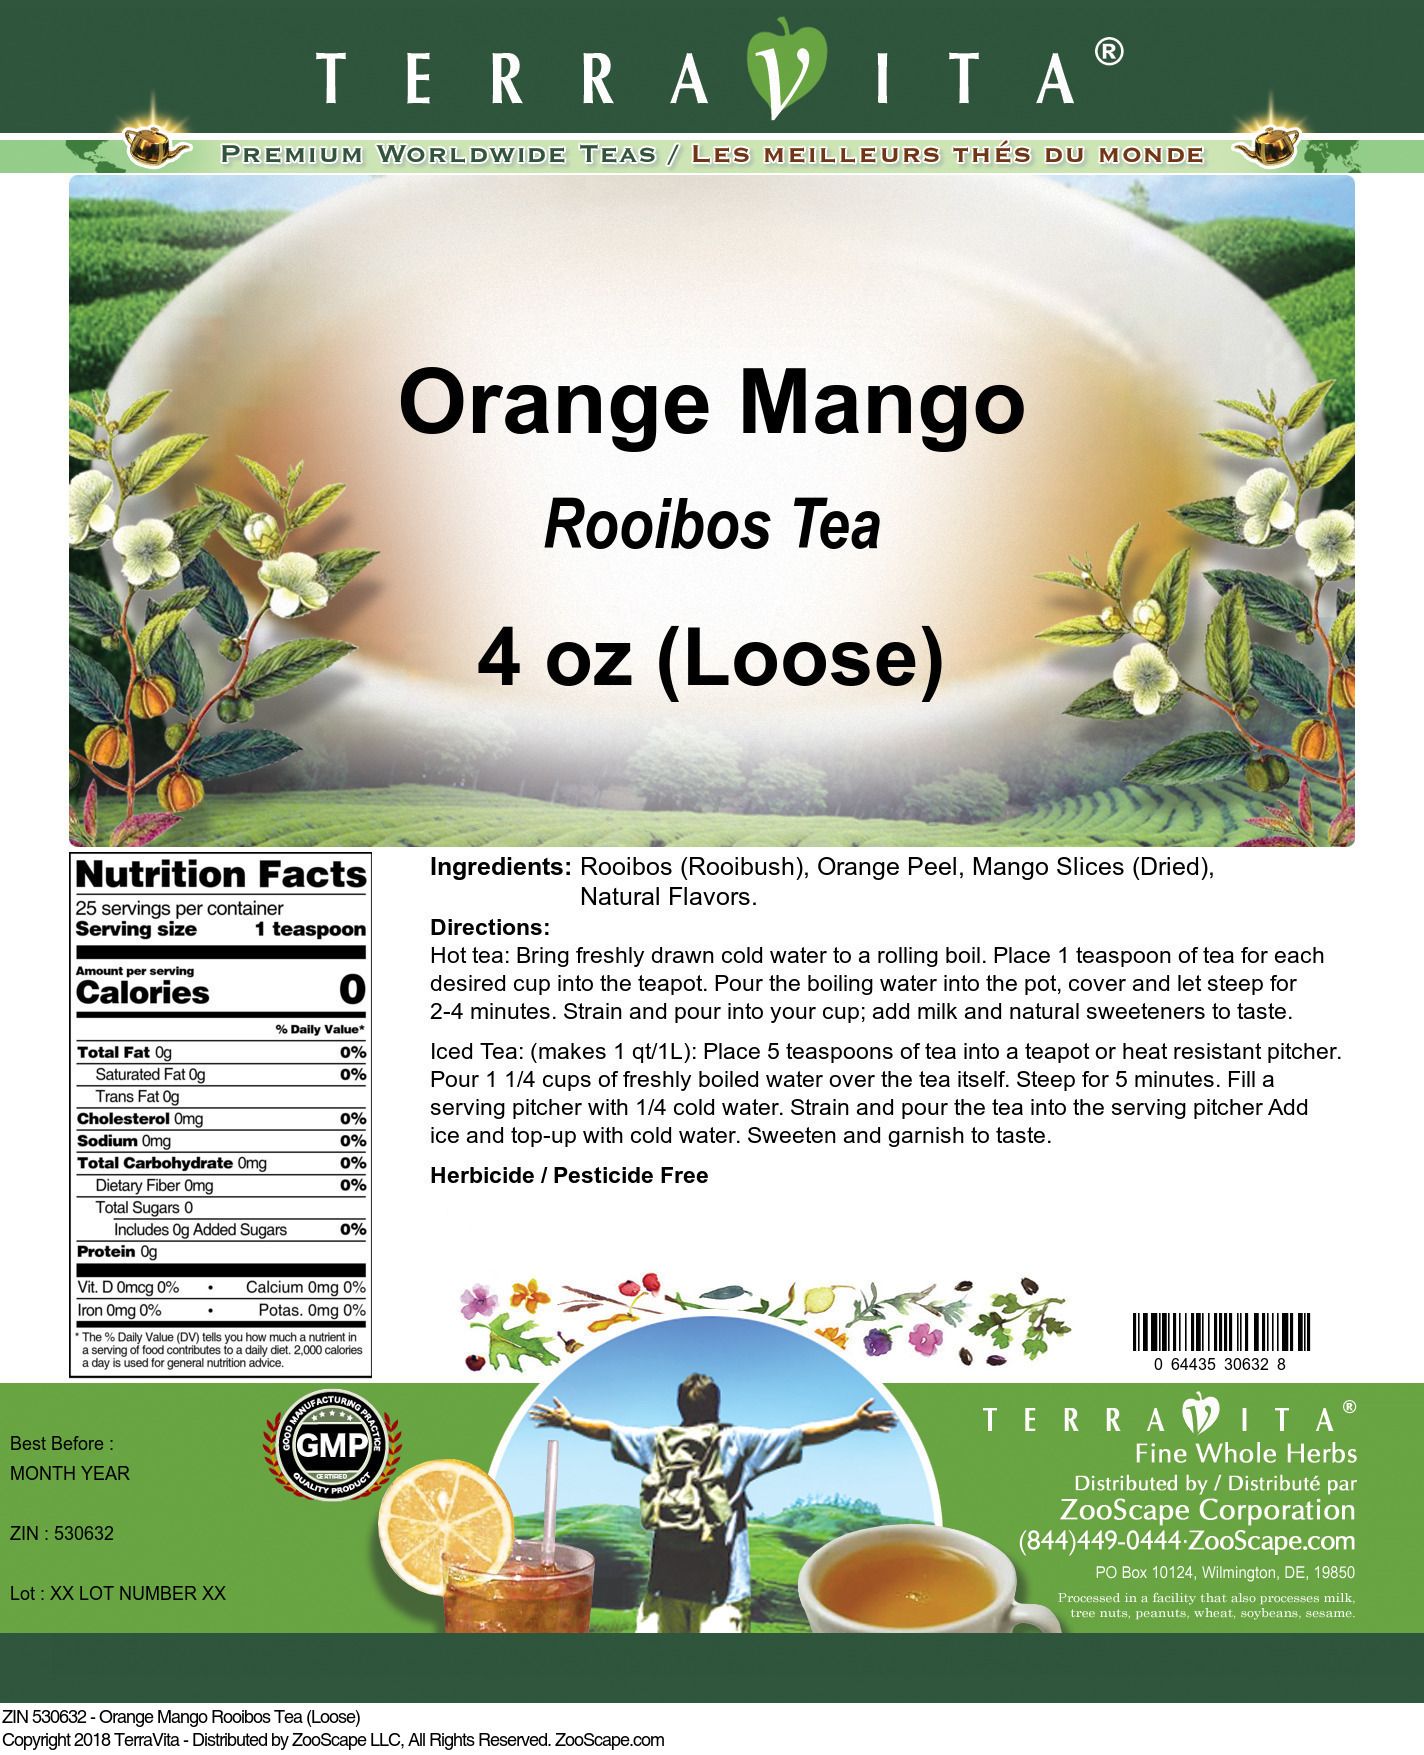 Orange Mango Rooibos Tea